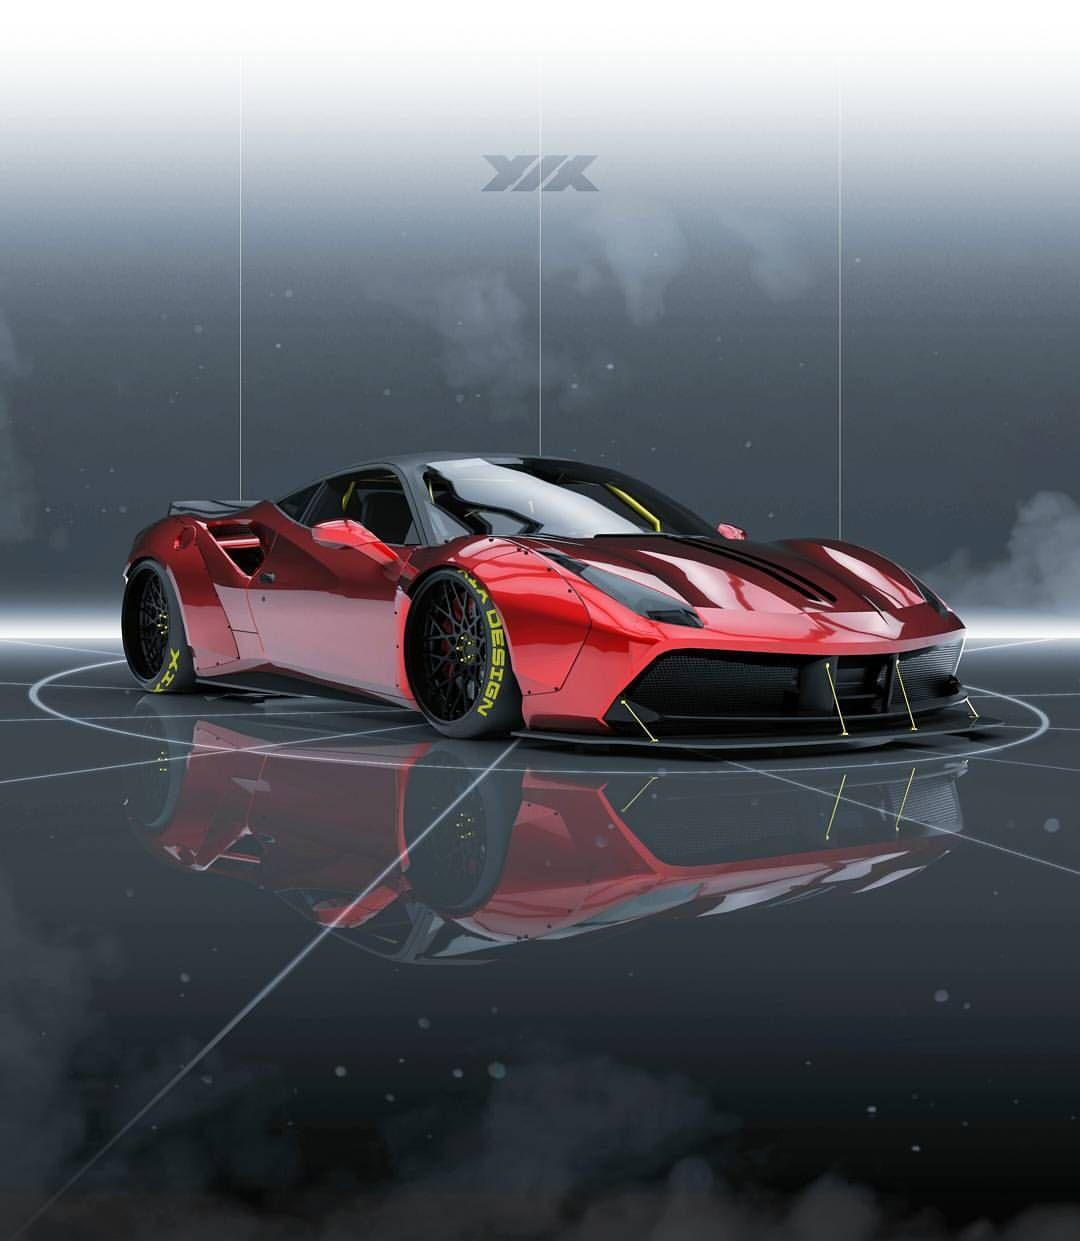 Xix3d On Instagram Liberty Walk Inspired Ferrari 488 Gtb Bmw Classic Cars Liberty Walk Super Cars